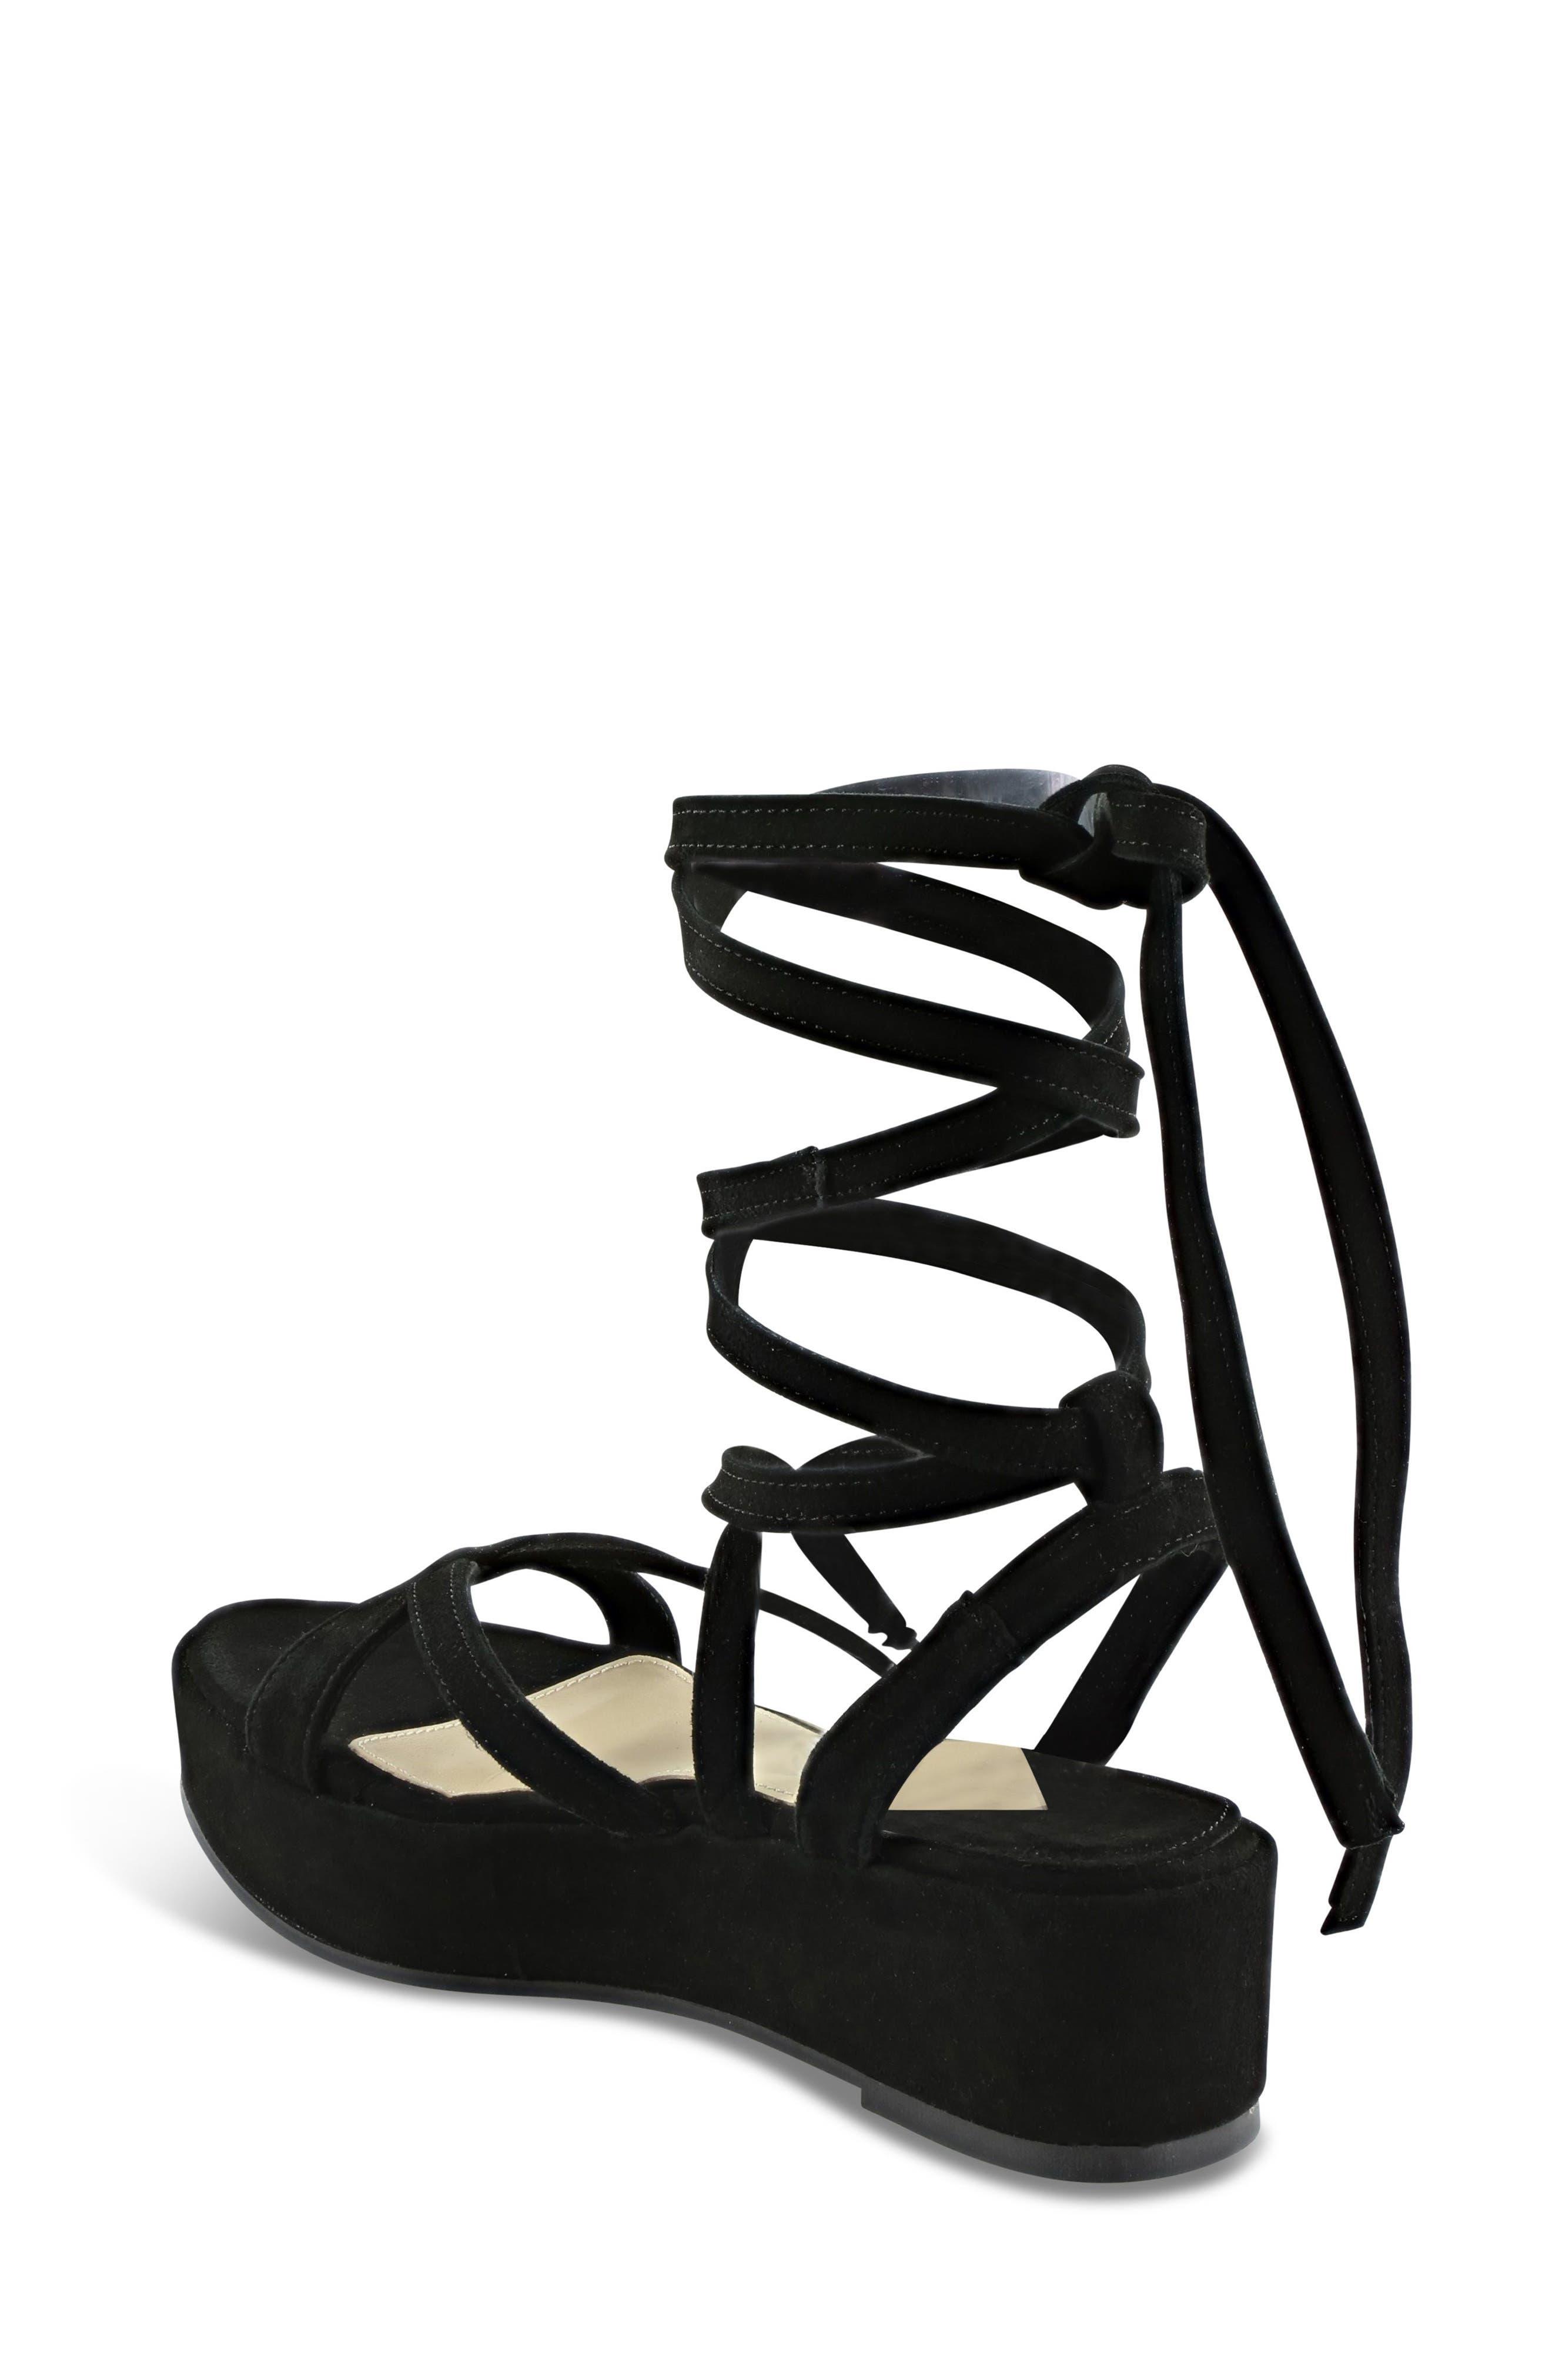 Keri Gladiator Platform Sandal,                             Alternate thumbnail 2, color,                             Black Suede